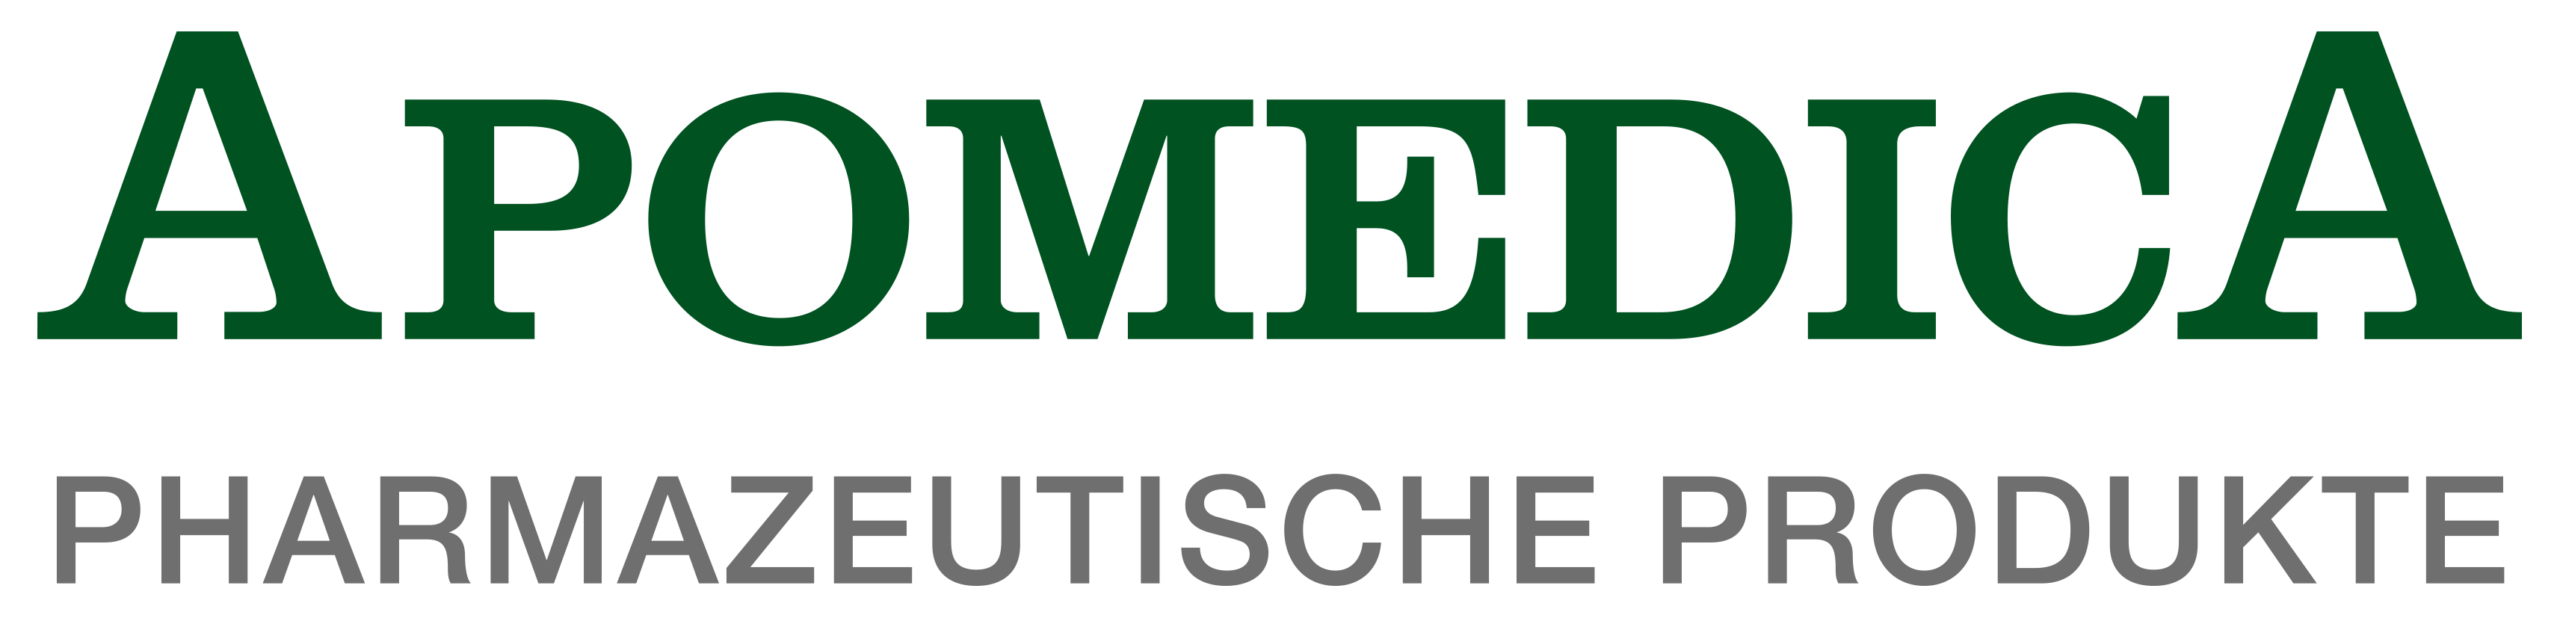 Apomedica Pharmazeutische Produkte GmbH